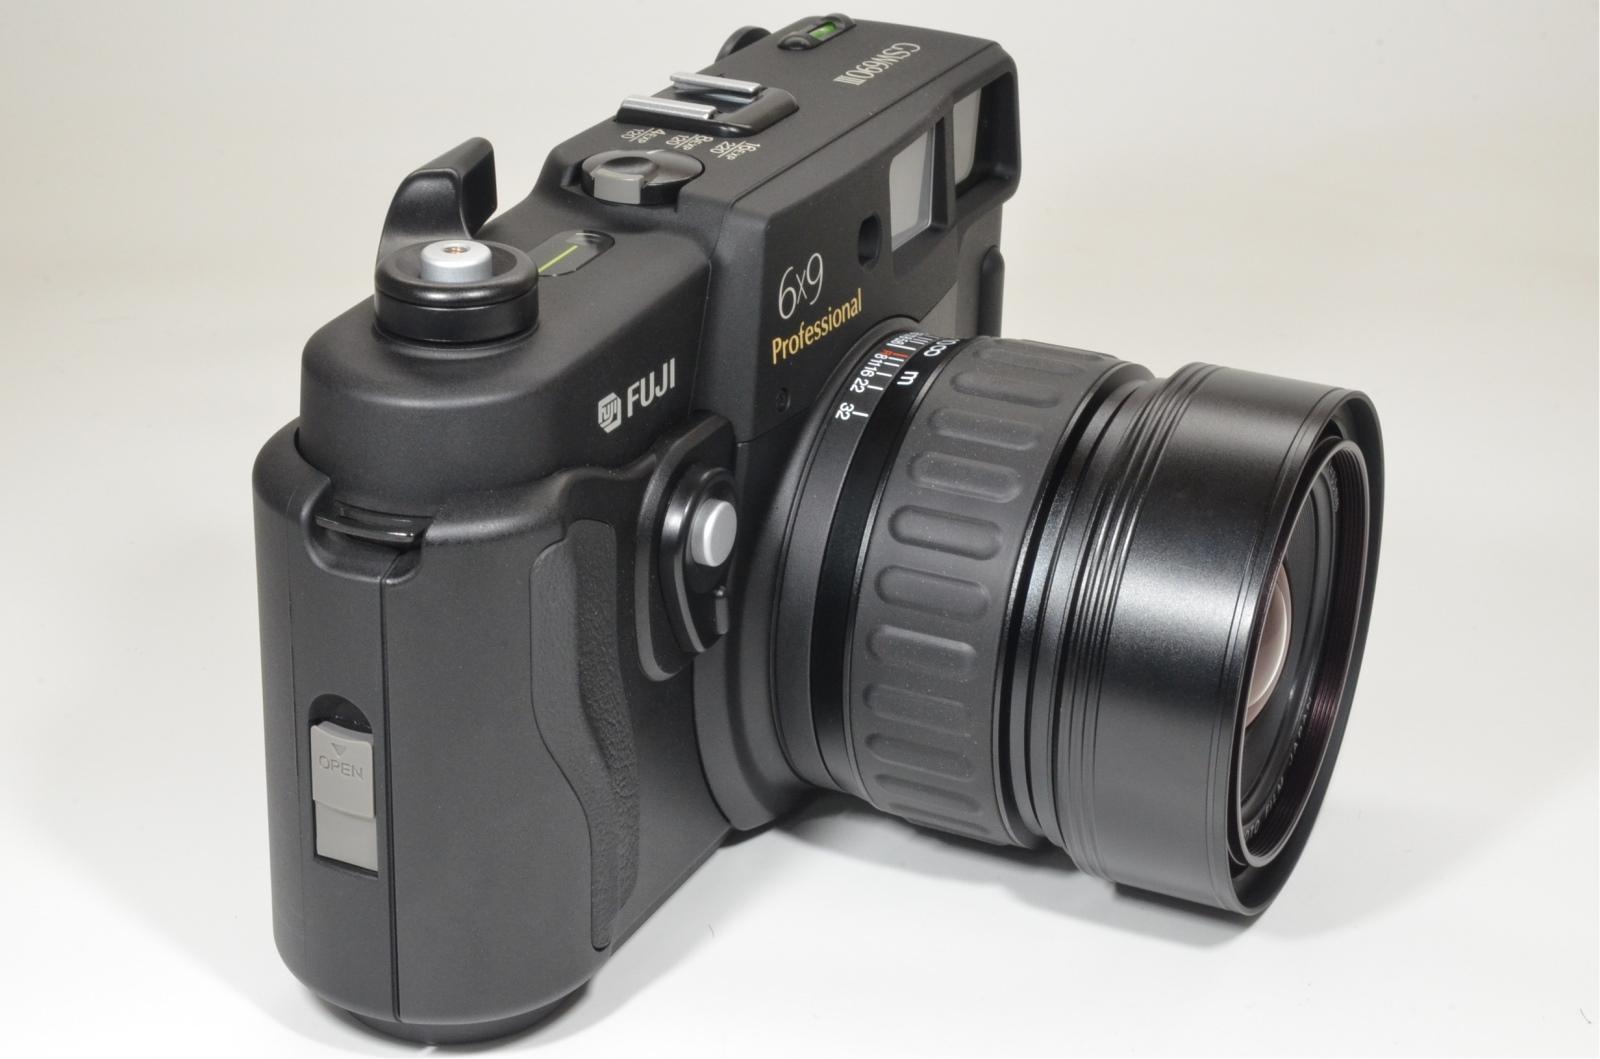 fuji fujifilm gsw690iii 65mm f5.6 count '060' medium format camera